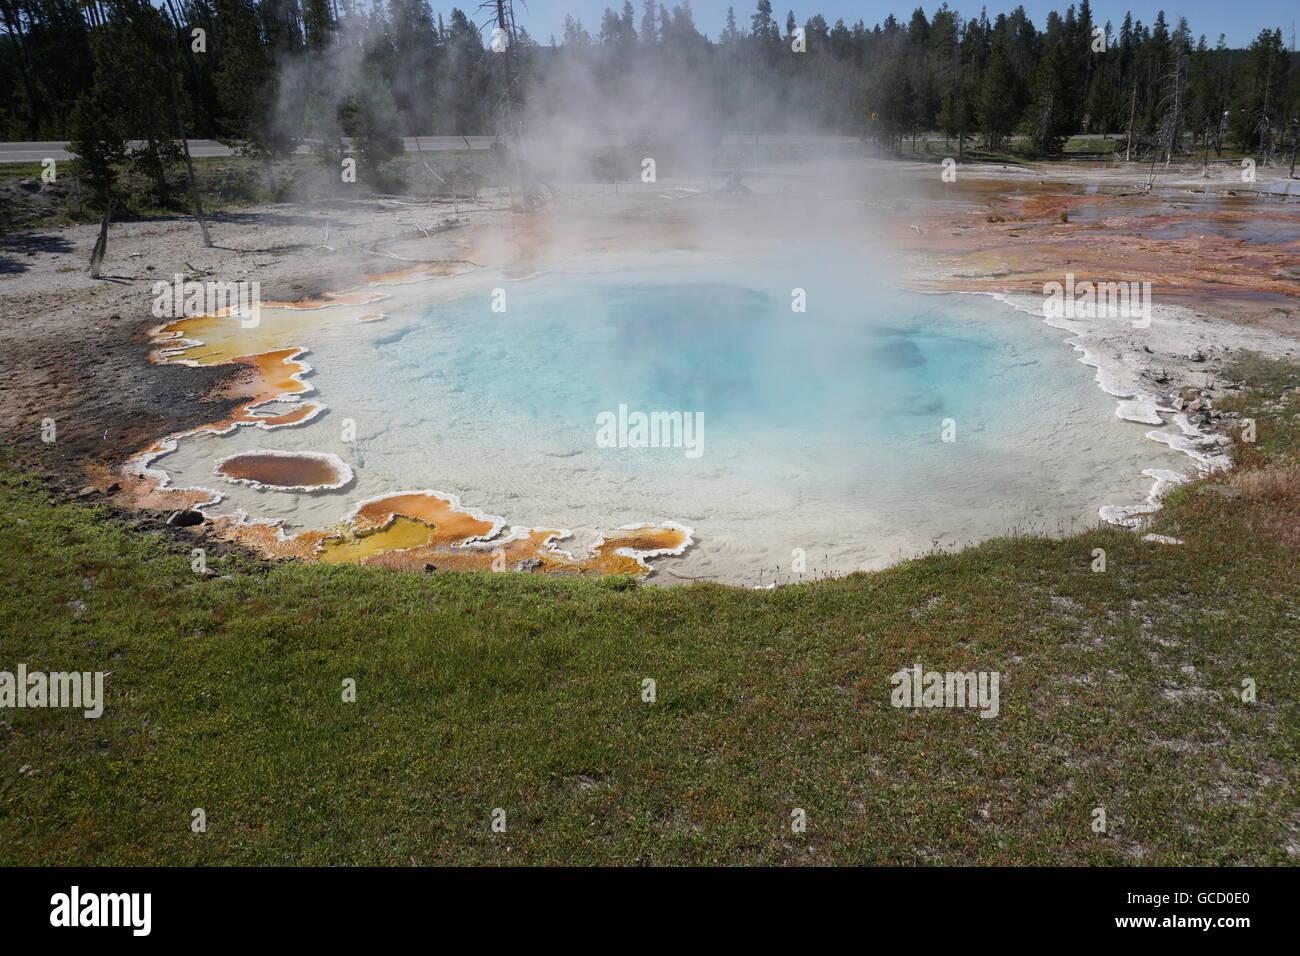 Celestine Pool at Fountain Paint Pot / Lower Geyser Basin, Yellowstone National Park Stock Photo